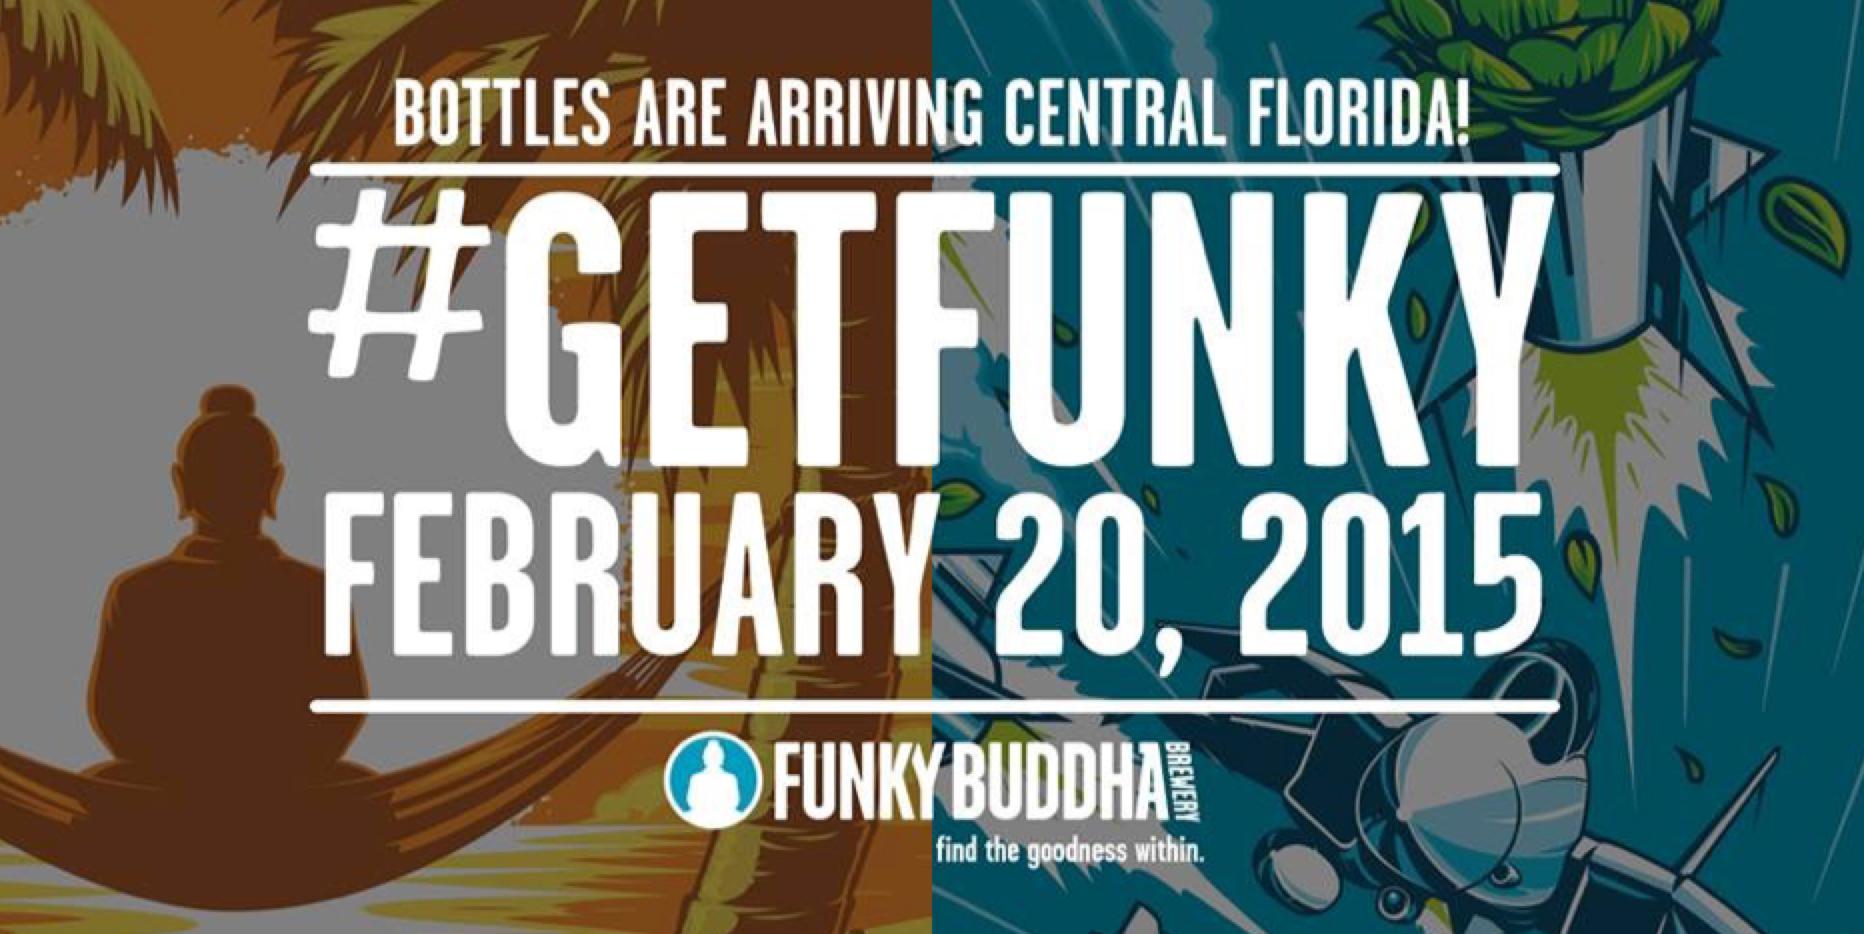 Funky_Buddha-Orlando_Bottle_Release